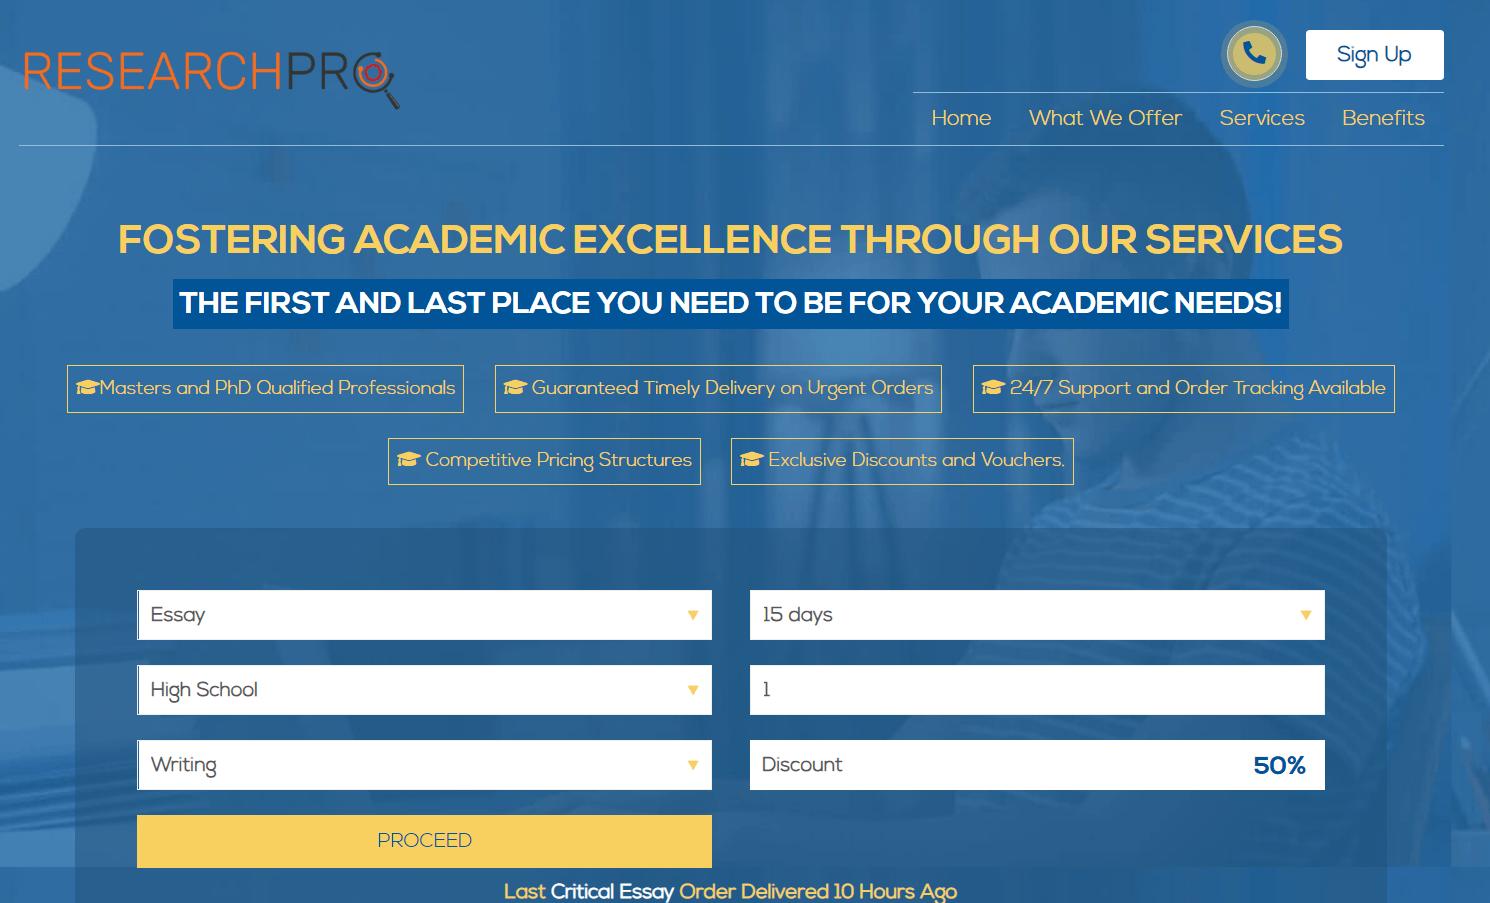 researchpro.co.uk